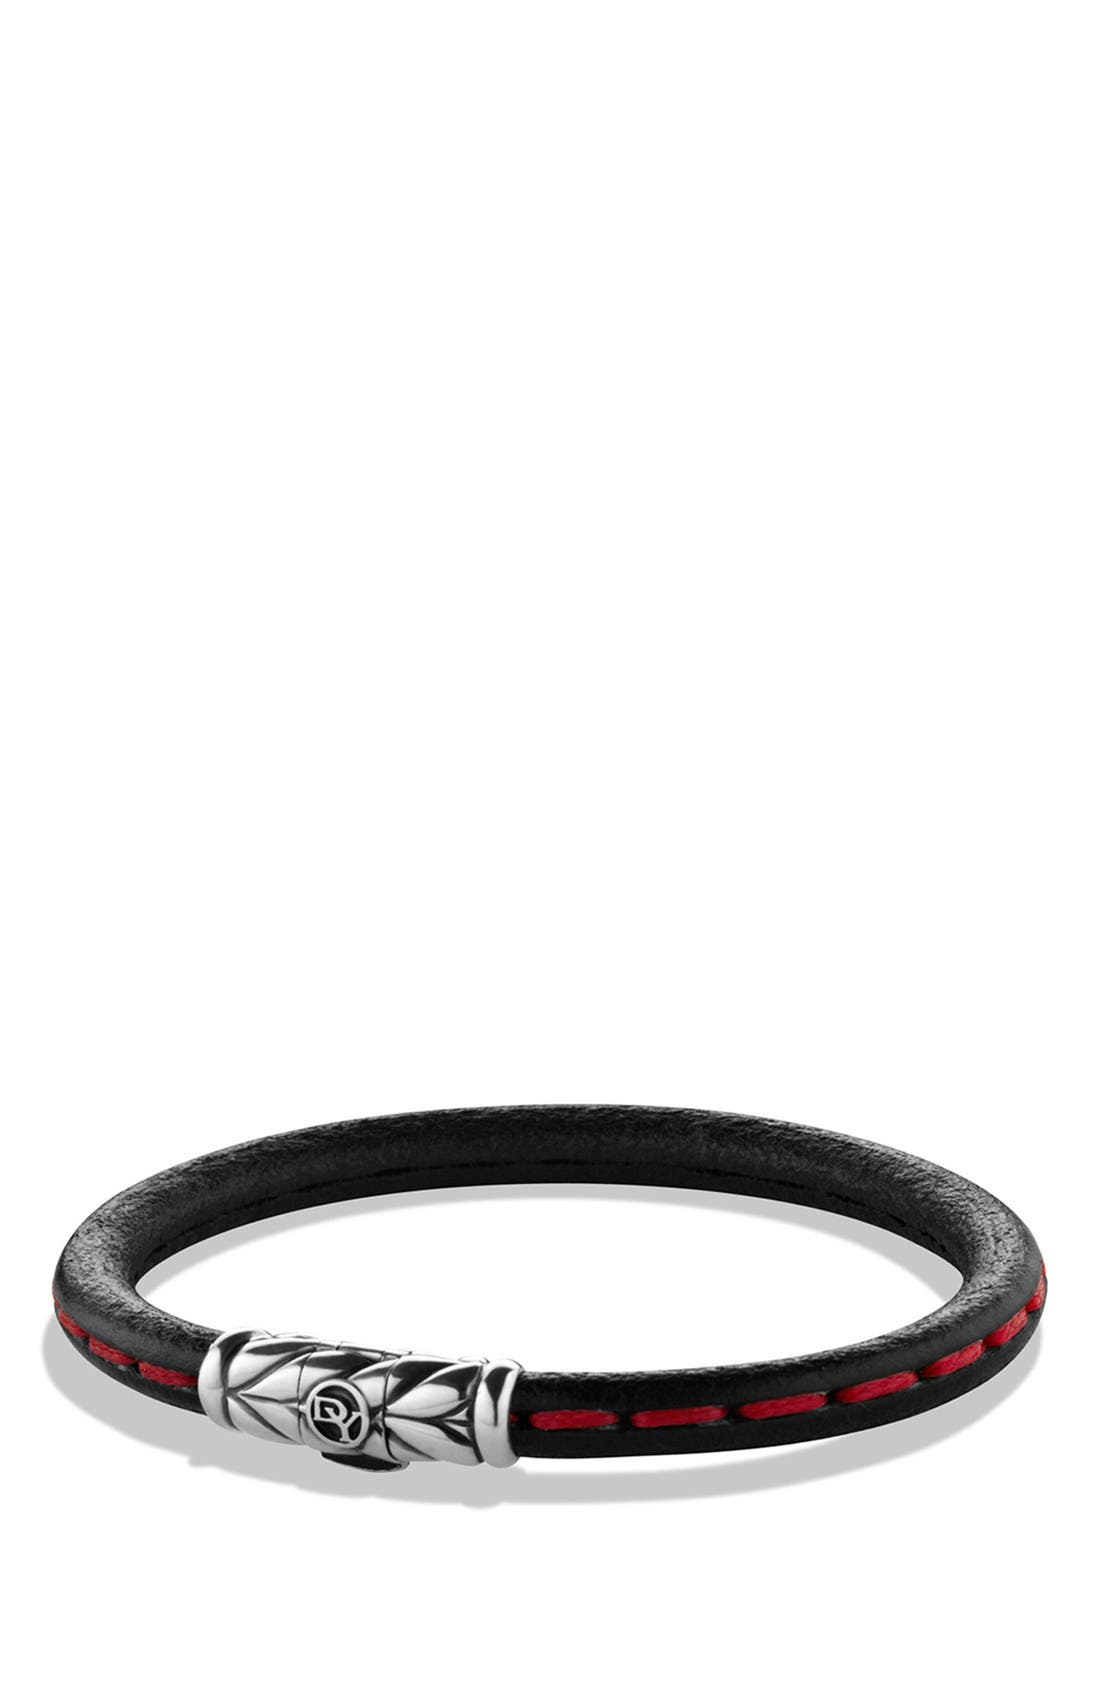 'Chevron' Leather Bracelet,                             Main thumbnail 1, color,                             Red Stitch